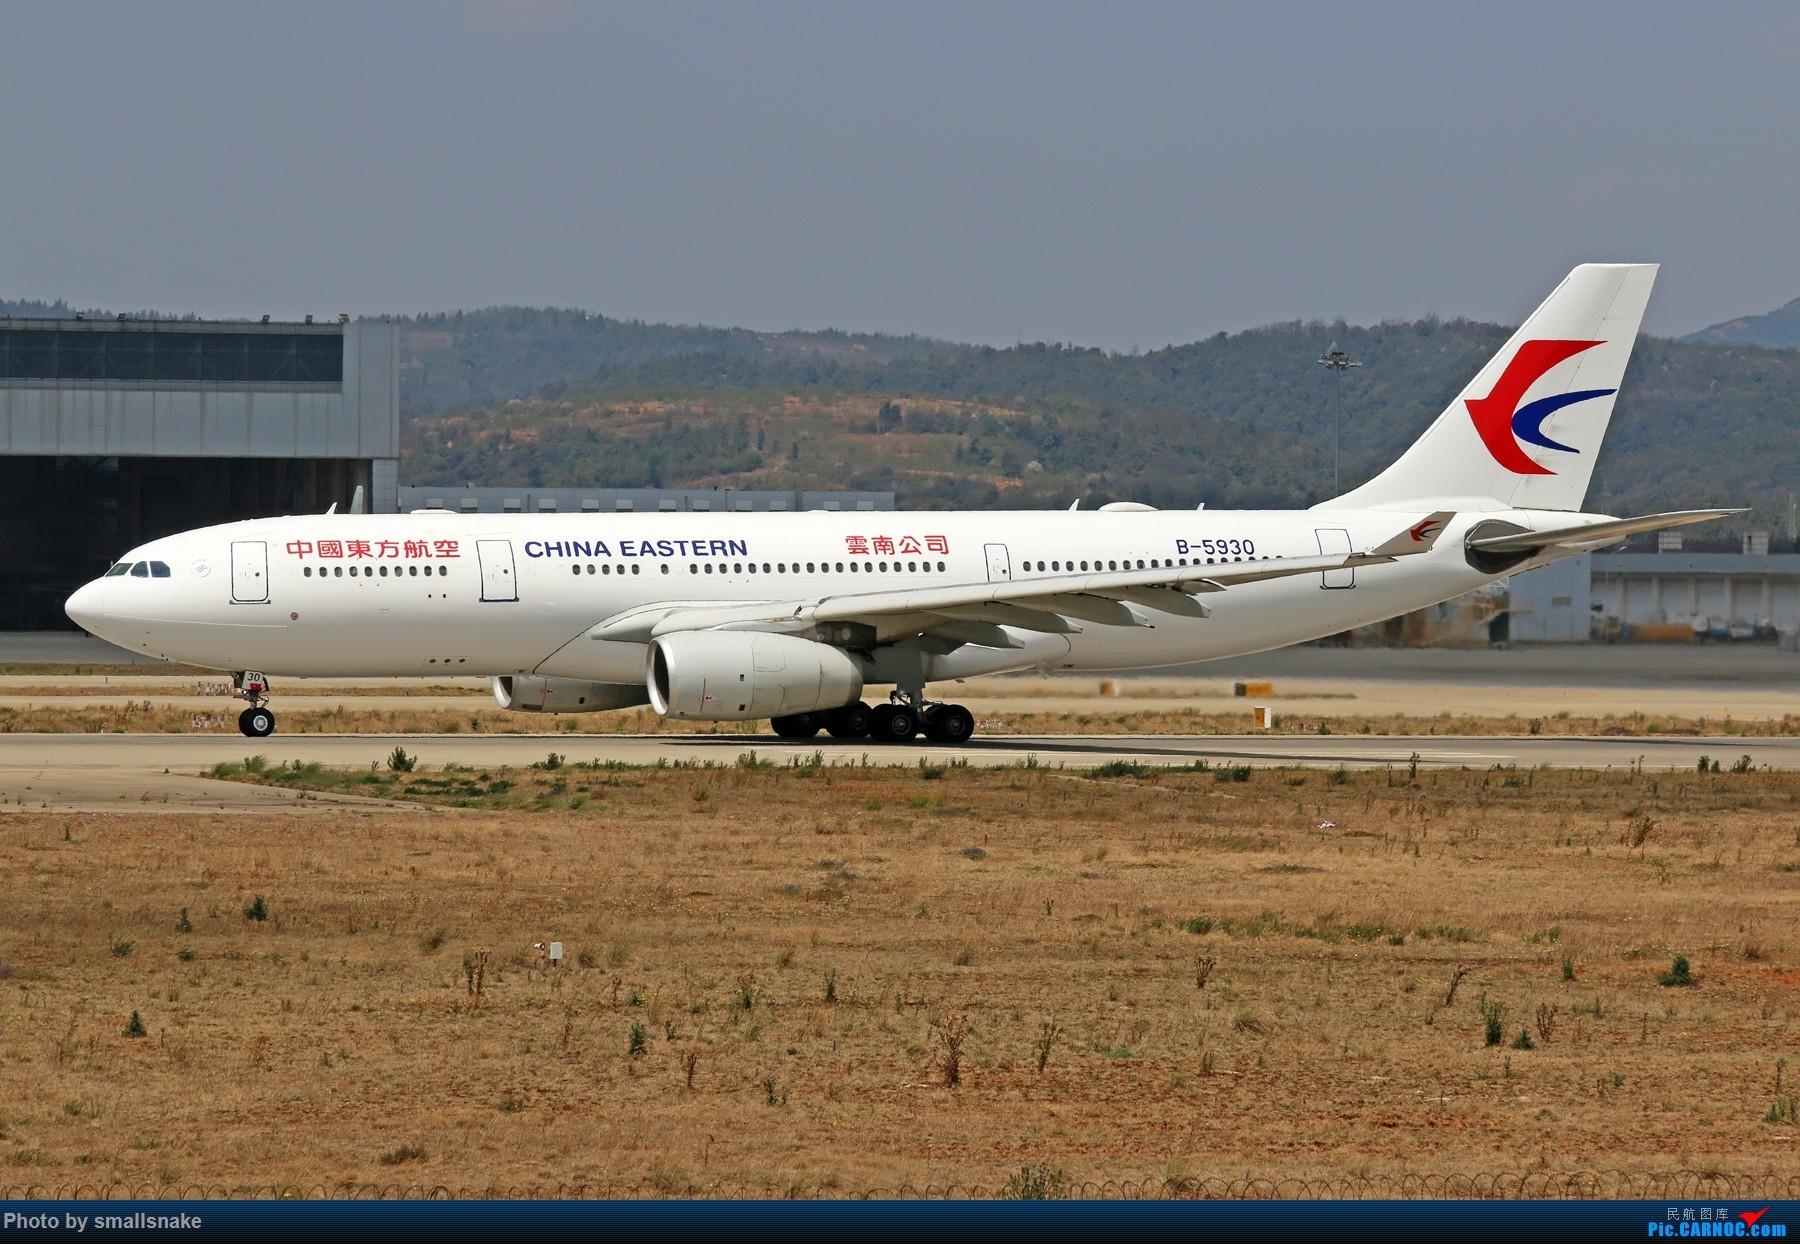 Re:[原创]KMG打卡... AIRBUS A330-200 B-5930 昆明长水国际机场